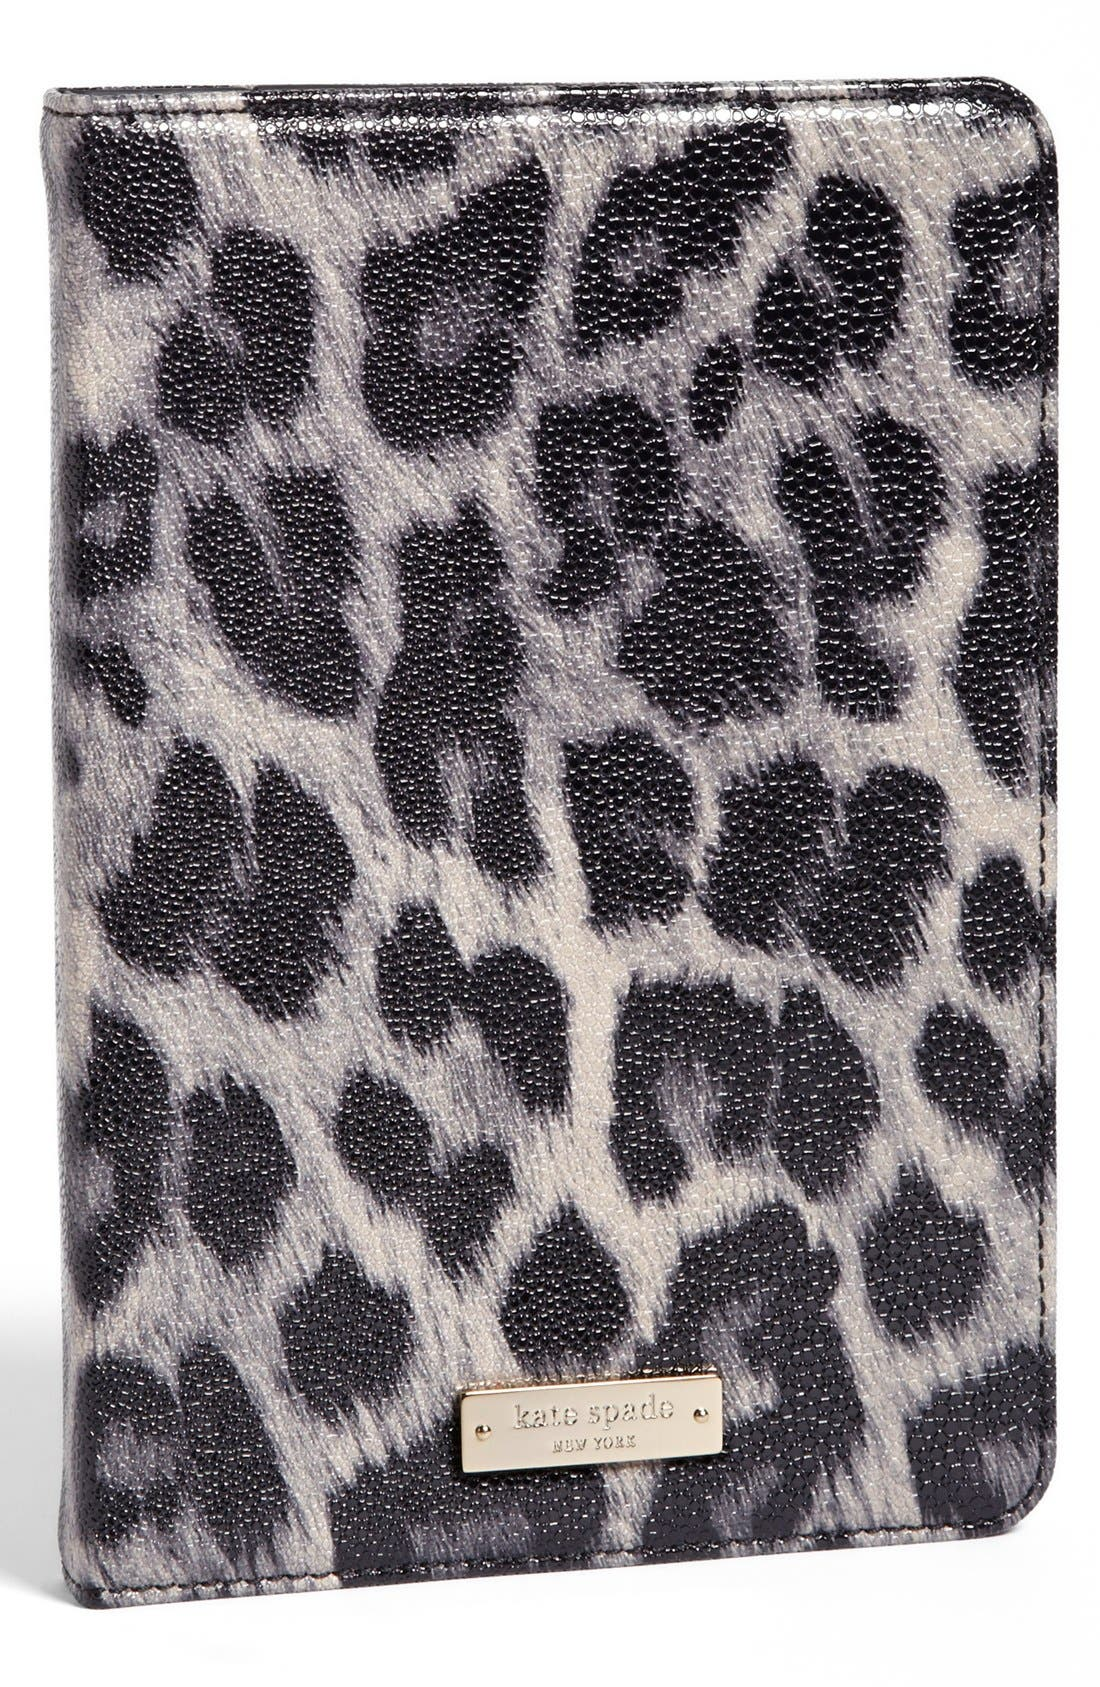 Alternate Image 1 Selected - kate spade new york 'leroy street' iPad mini case